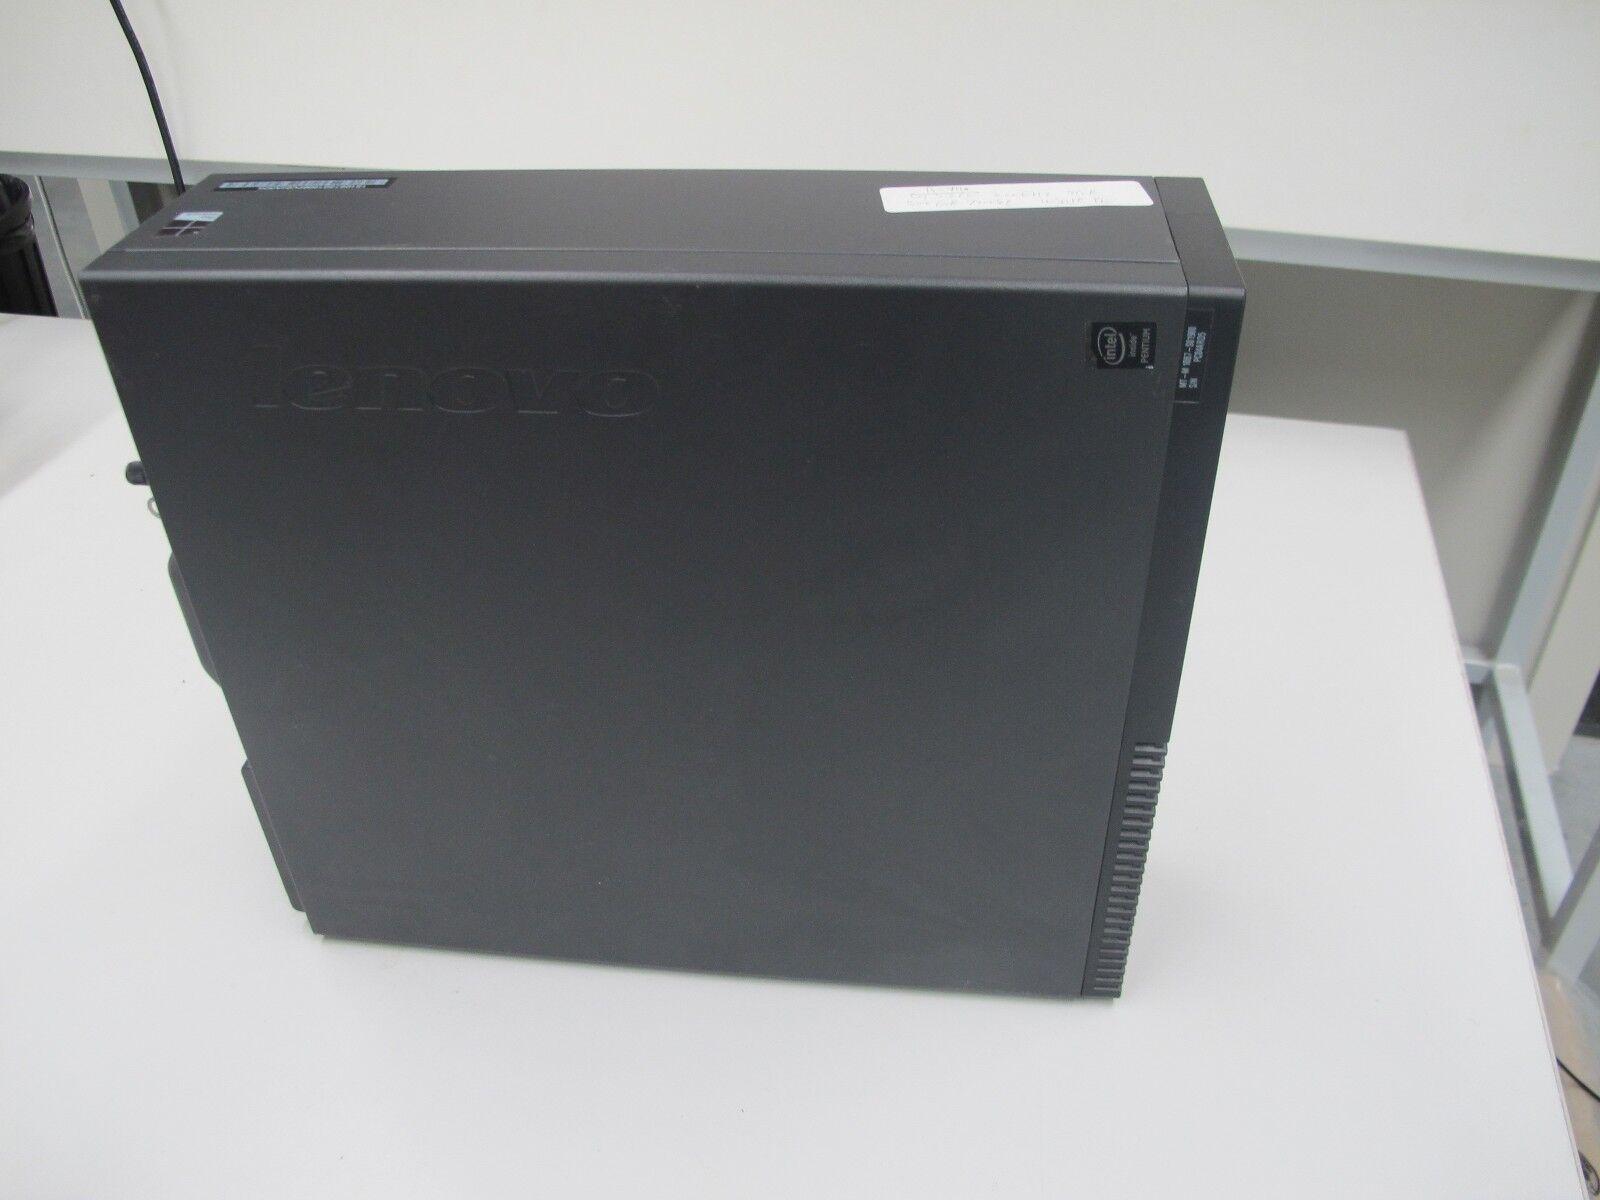 Laptop Windows - LENOVO Thinkcentre M73 SFF  Intel i5 4th 500 GB HDD, 8GB RAM Windows 10 Pro -M22